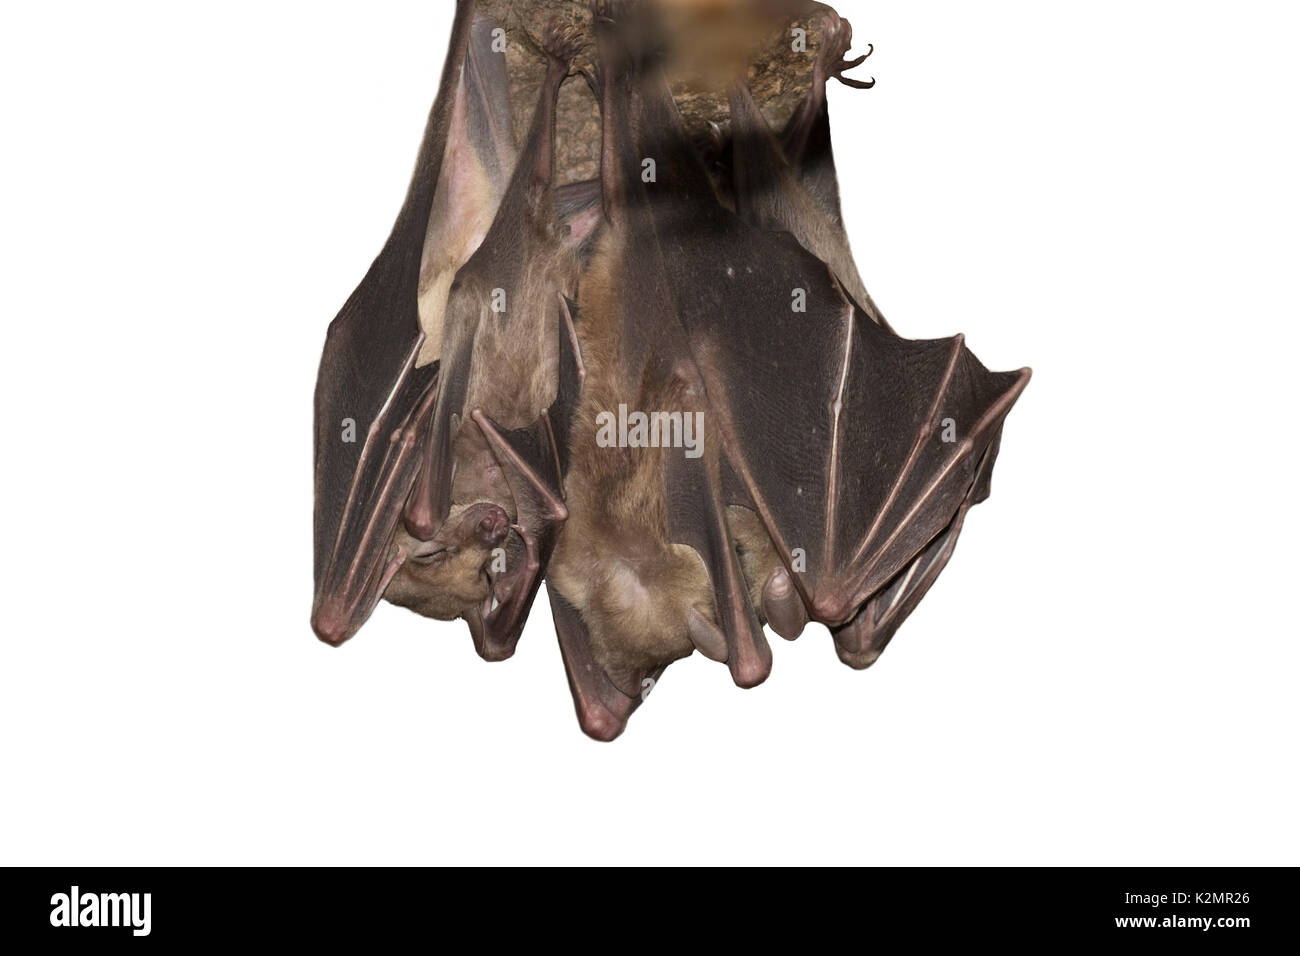 Egyptian fruit bats (Rousettus aegyptiacus) Stock Photo